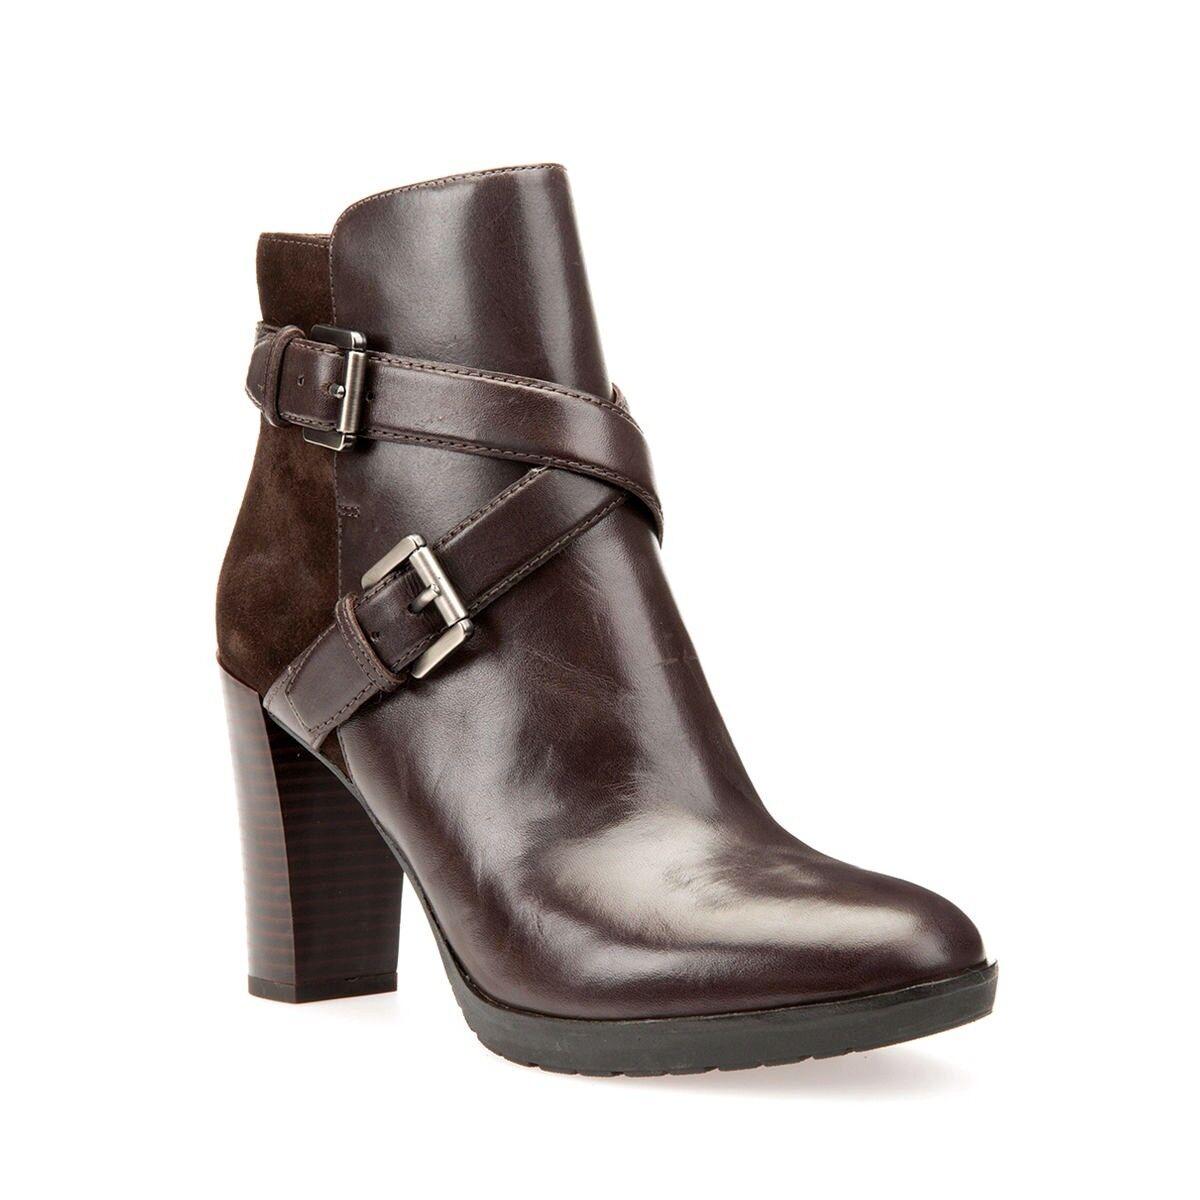 Geox damen UK 7.5 EU 41 Raphal braun Suede   Leather Combi Heeled Ankle Stiefel